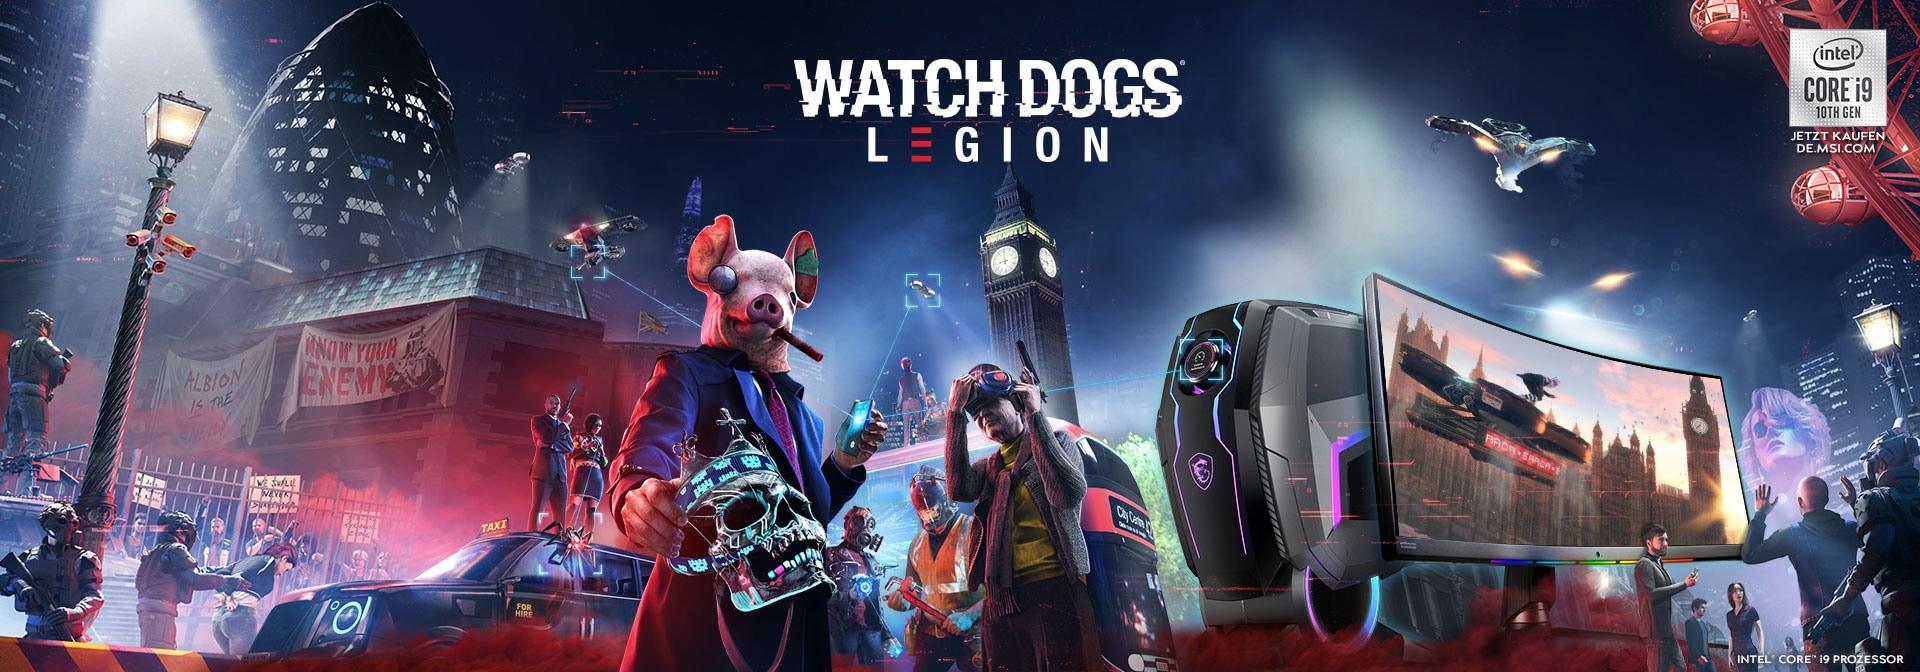 Watch Dogs Legion game bundle